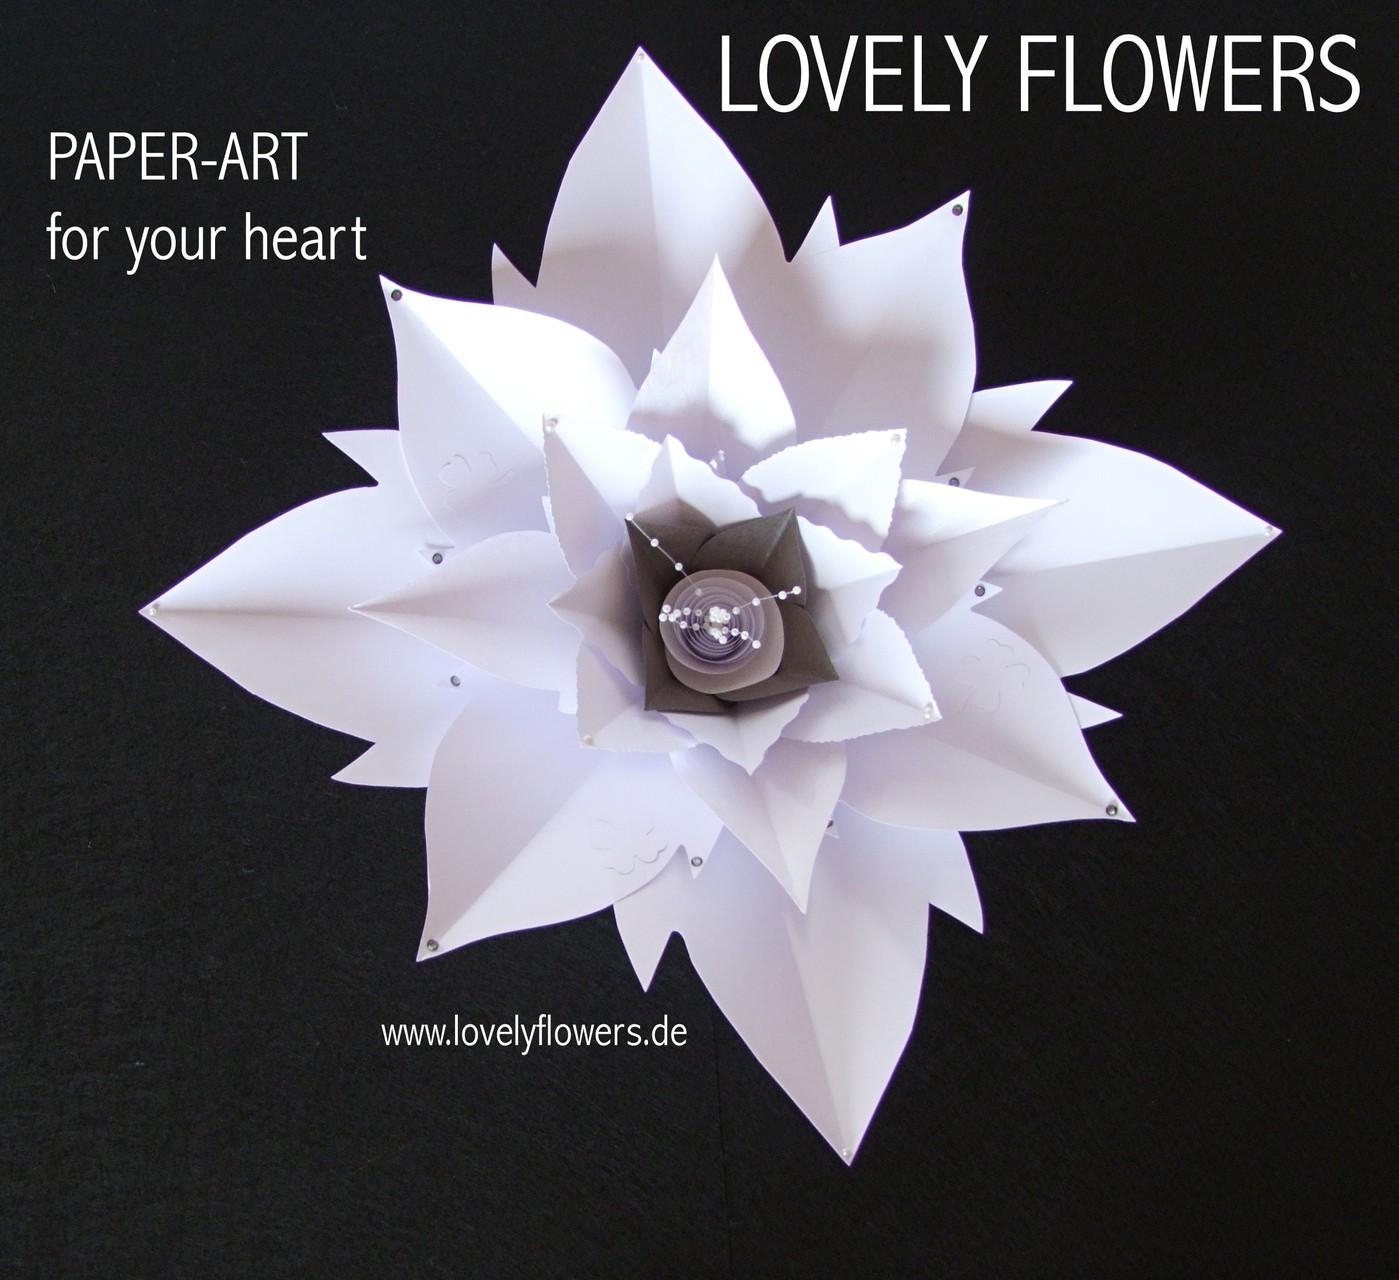 Paper-Art Hochzeitsstrauß Großblüte handmade by www.lovelyflowers.de